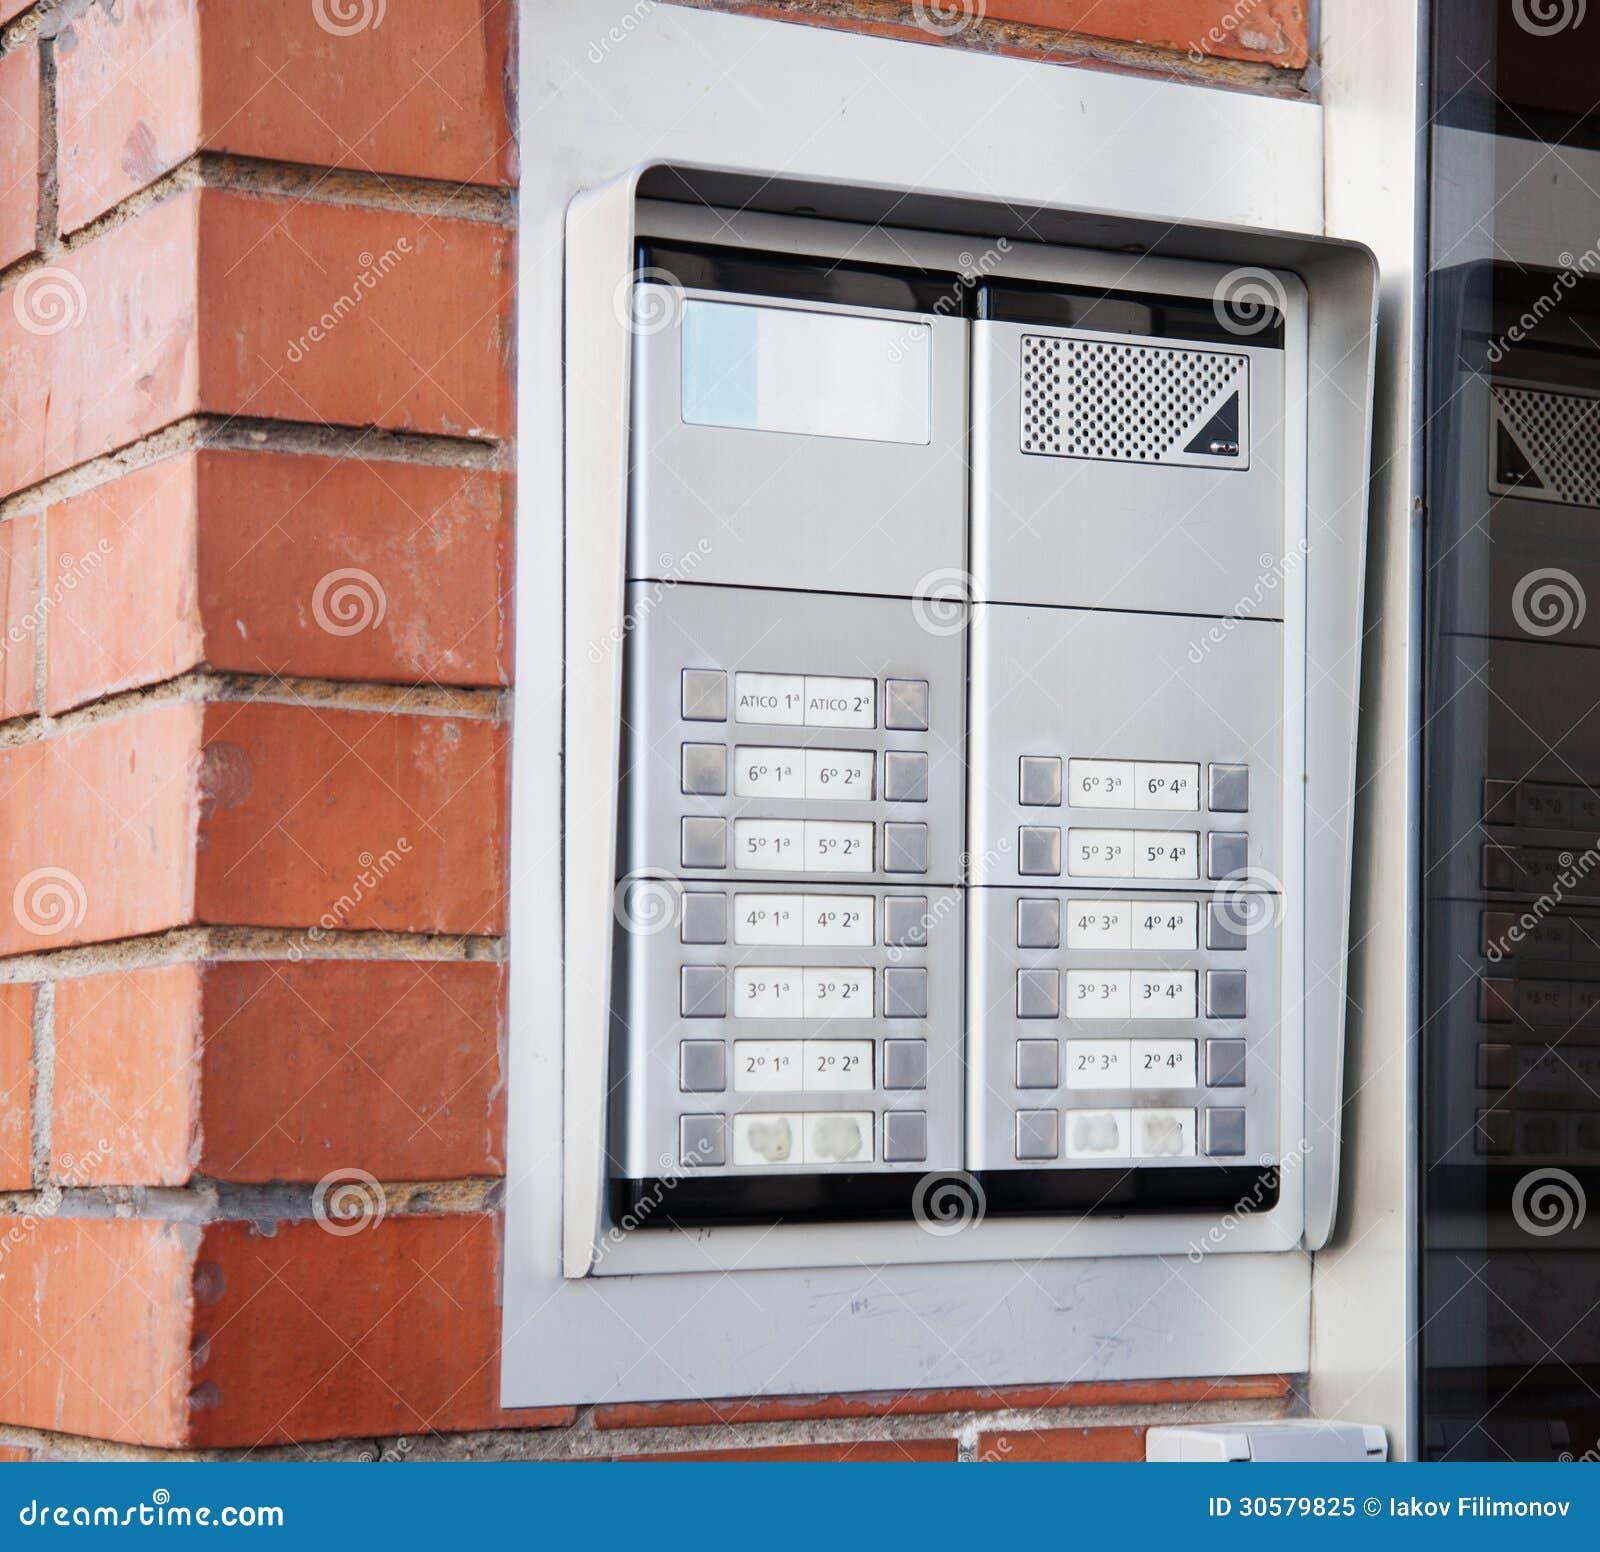 Closest Apartments: New Building Intercom Royalty Free Stock Photo